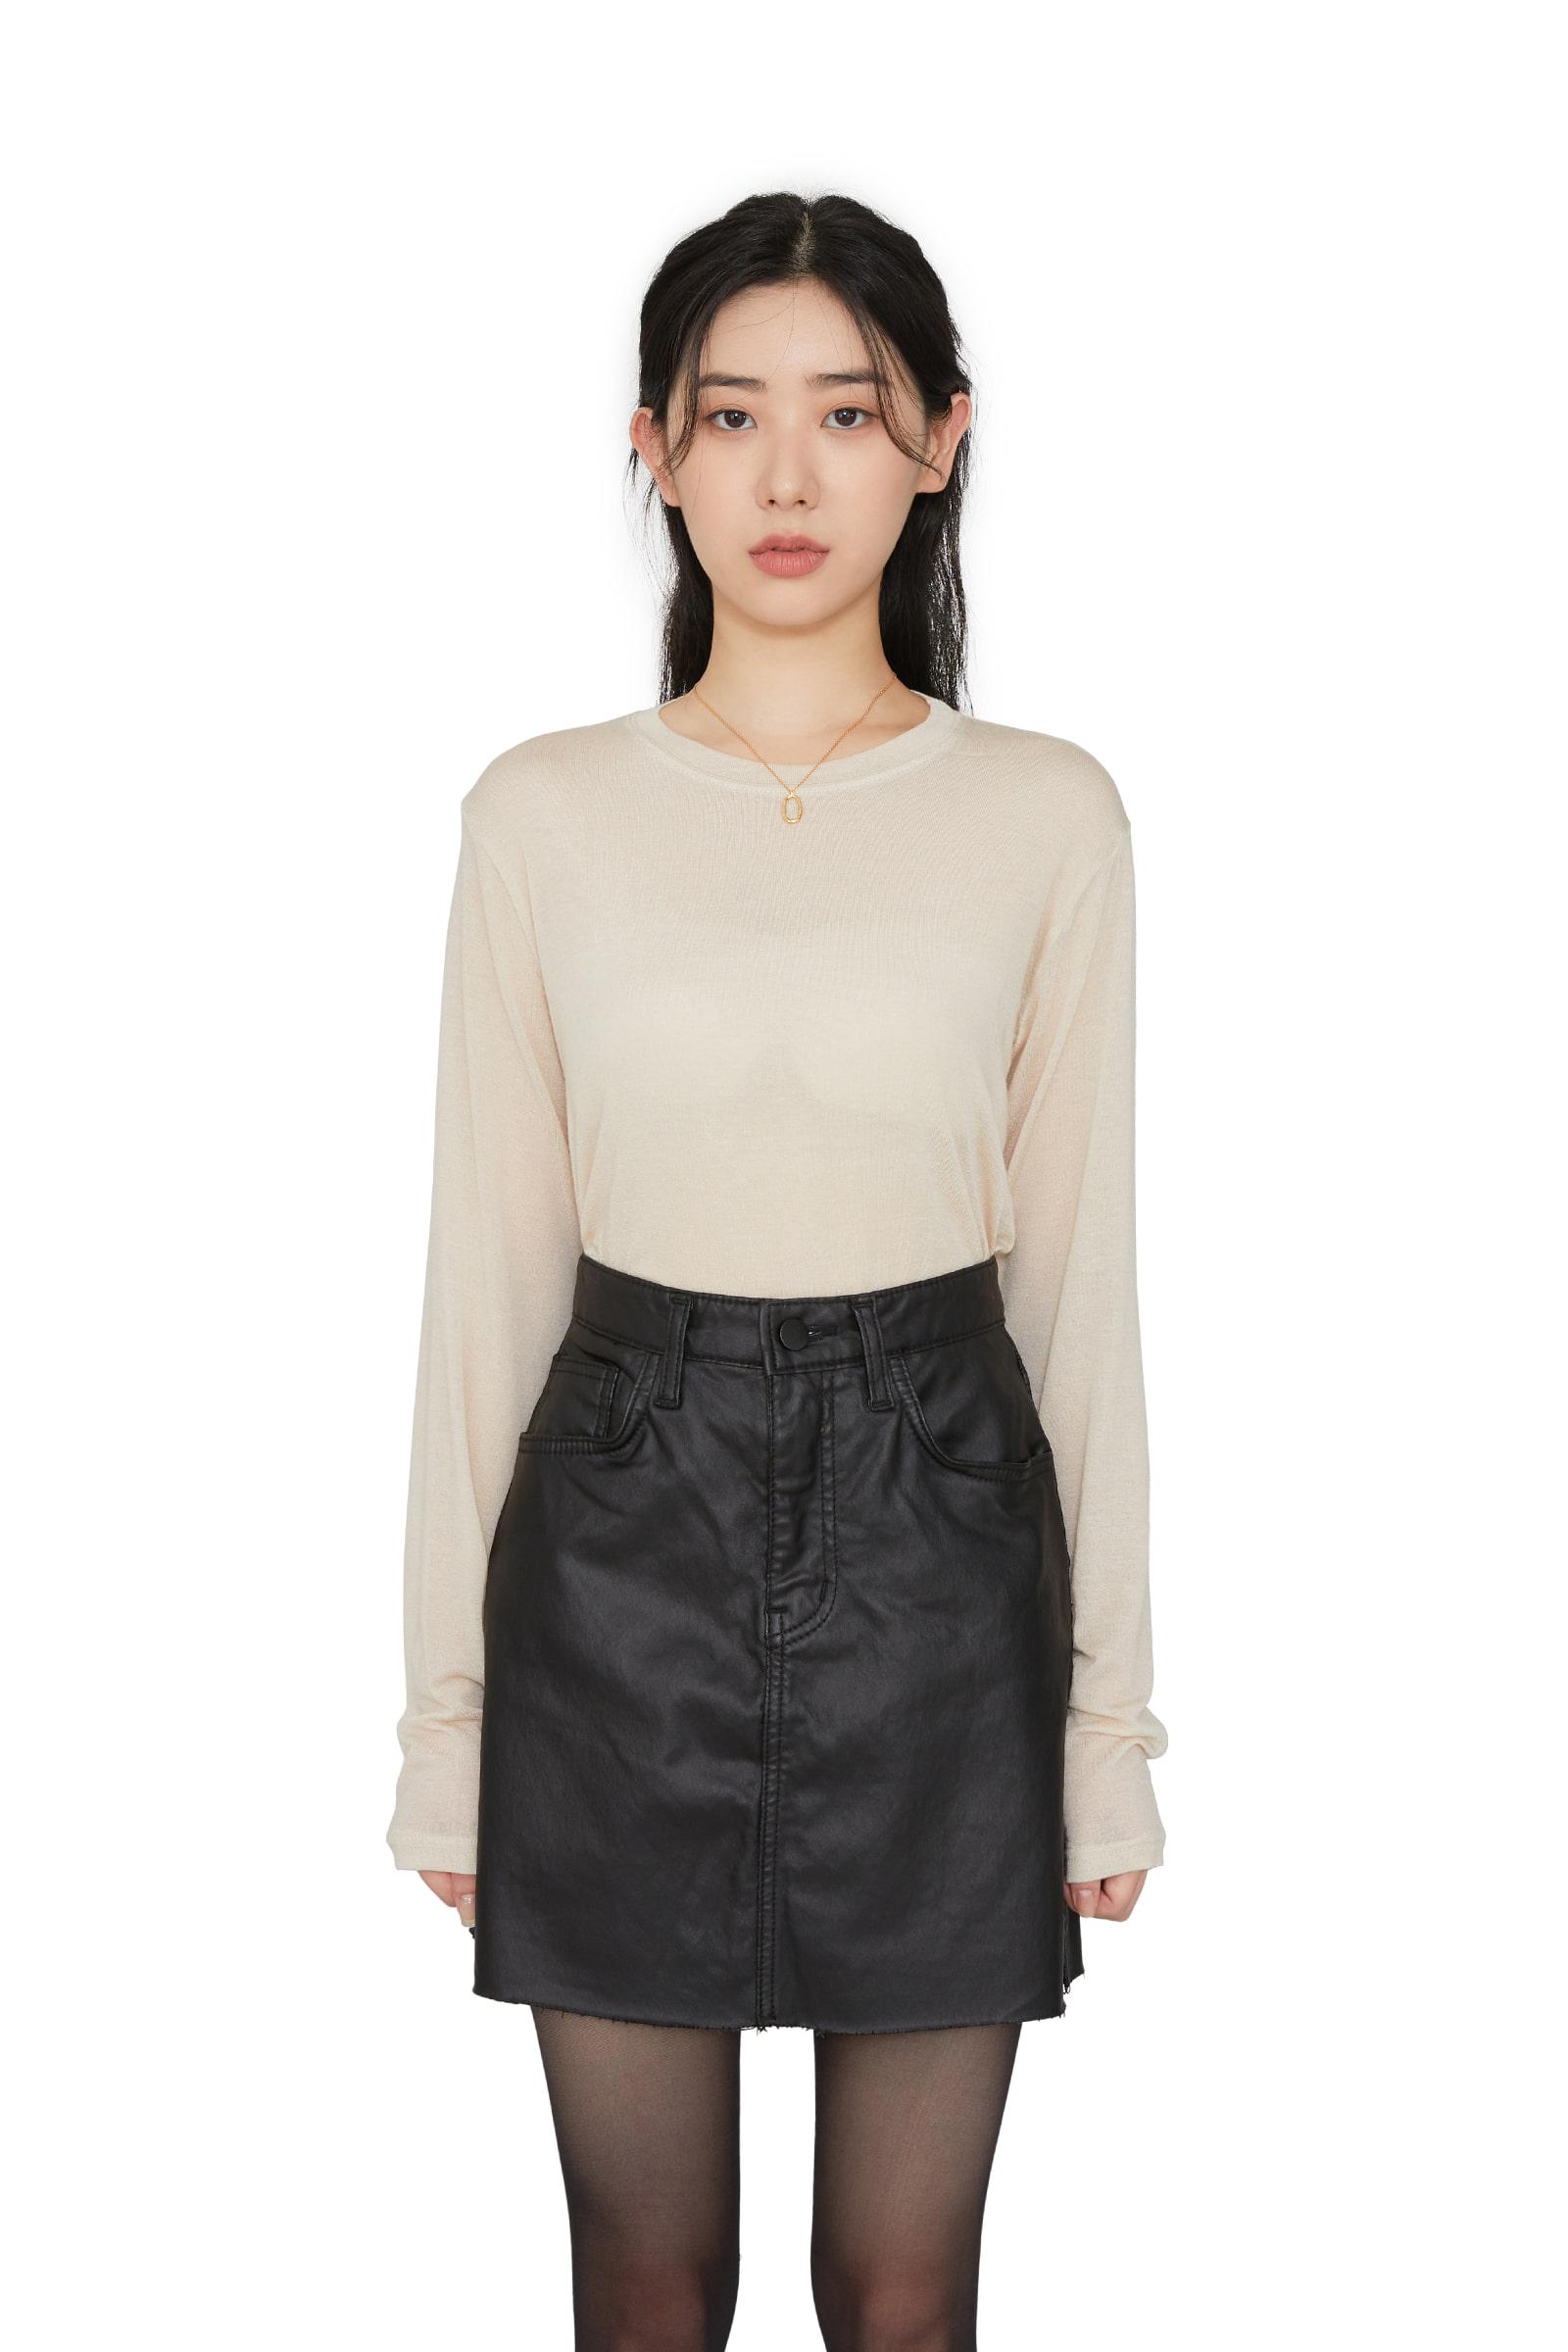 Sally Tencel long sleeve T-shirt